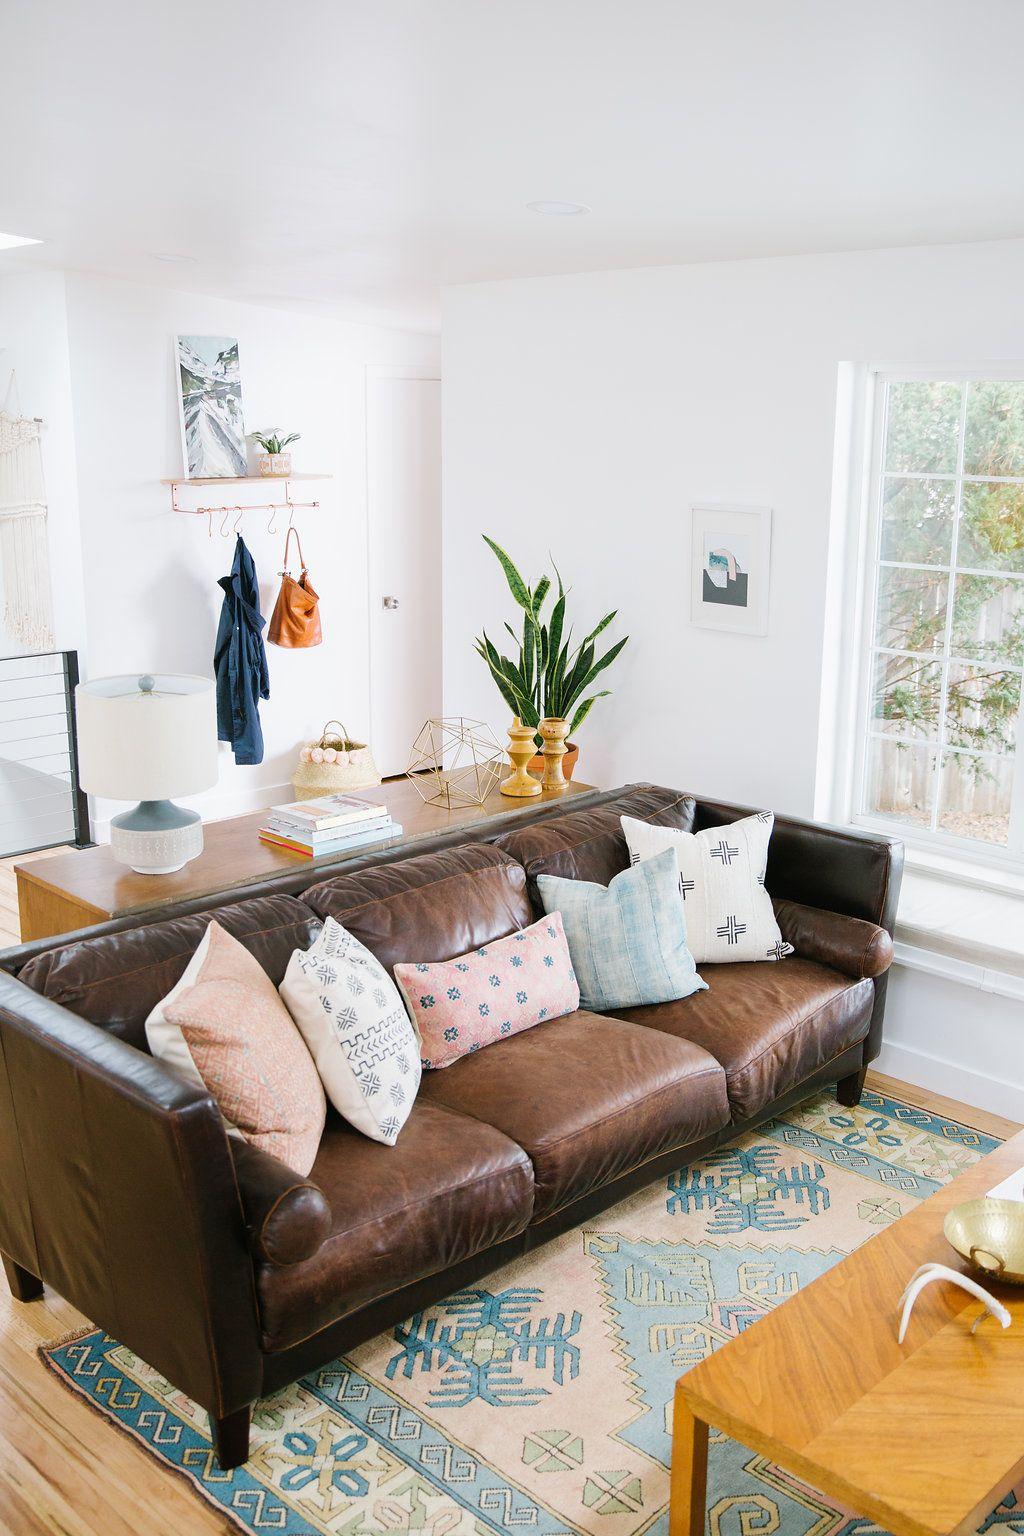 Pinterest: tobieornotobie | a b o d e | Pinterest | Leather sofas ...